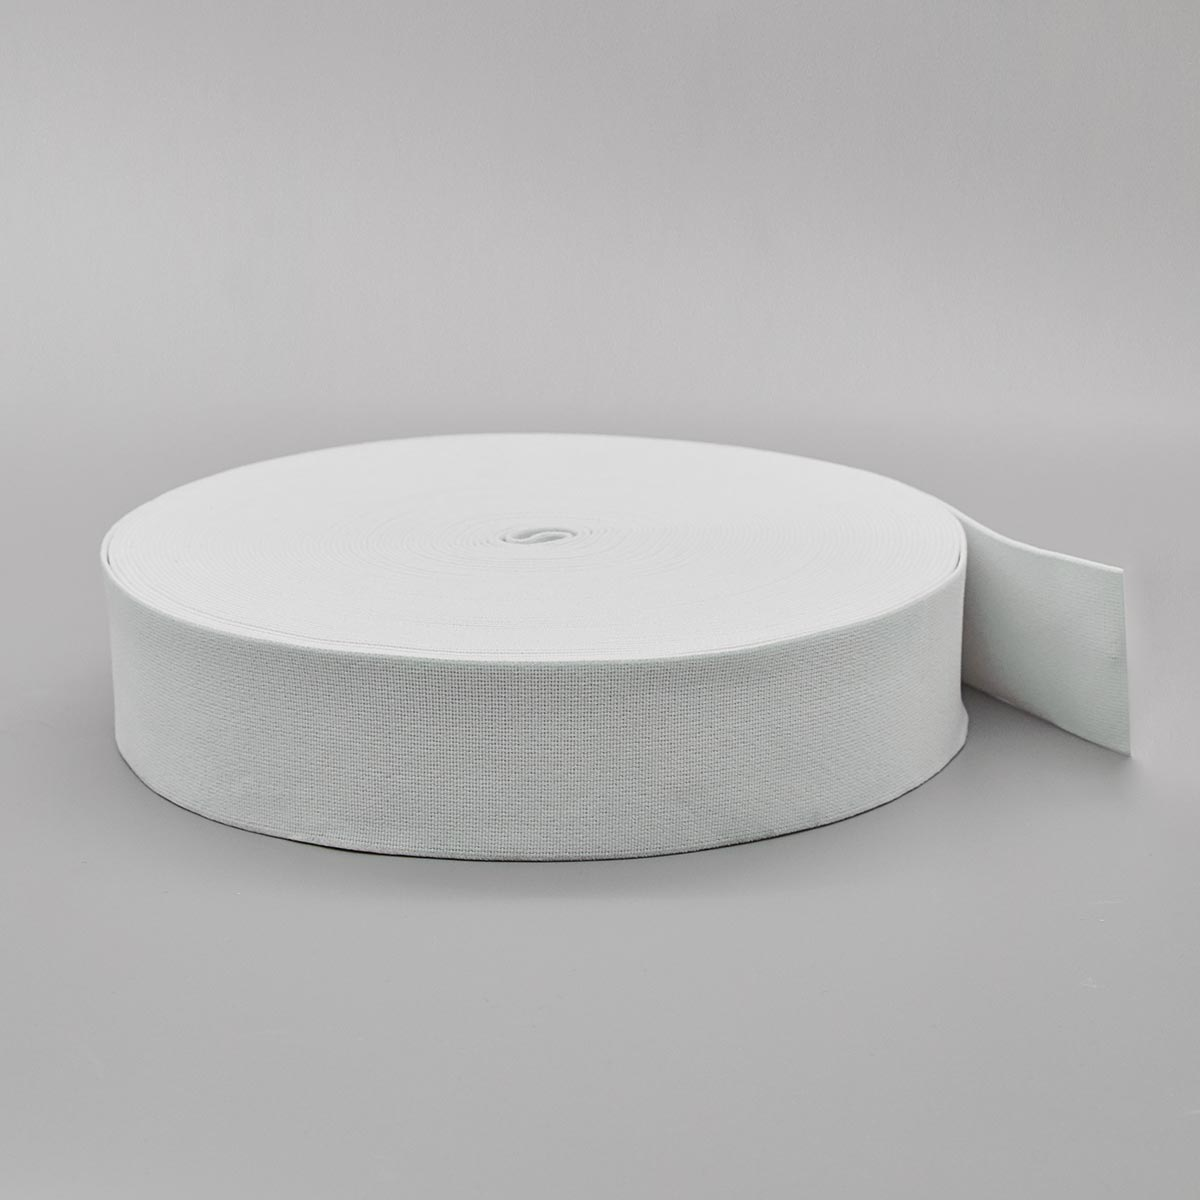 5050Б Резинка башмачная 50мм*25м, белая